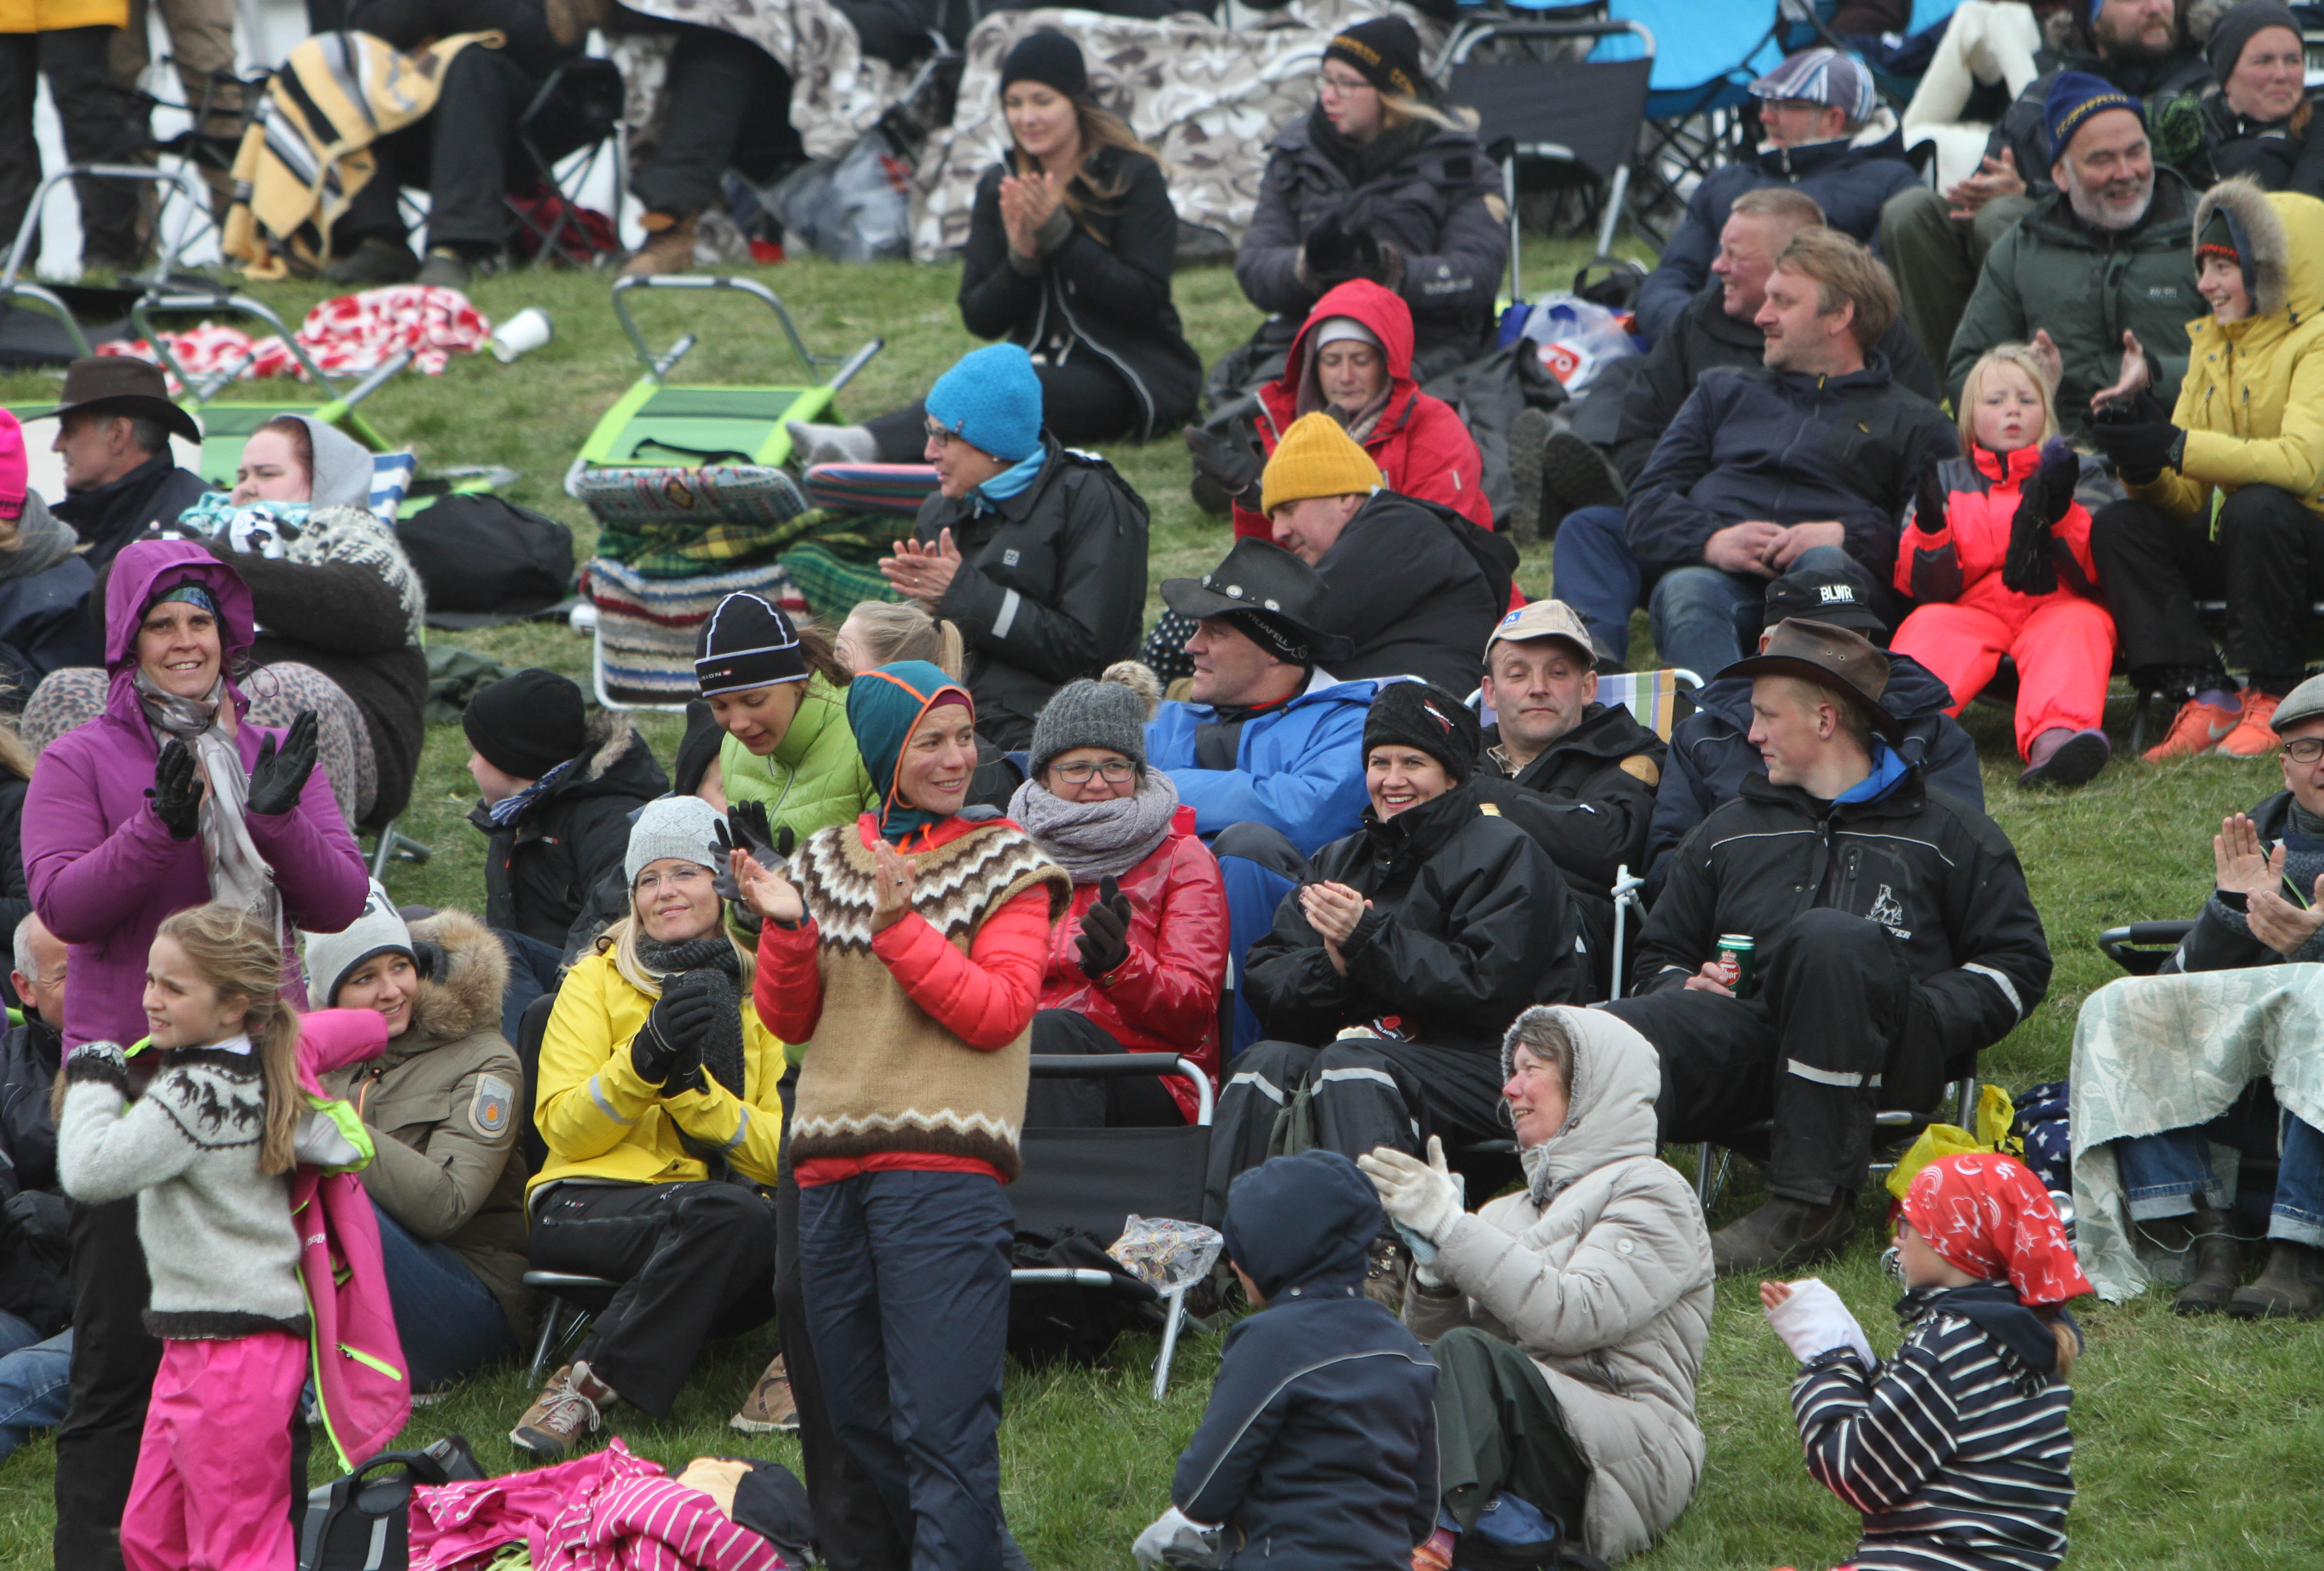 Kunnig och entusiastisk publik. Foto: Karin Cederman/Ishestnews.se